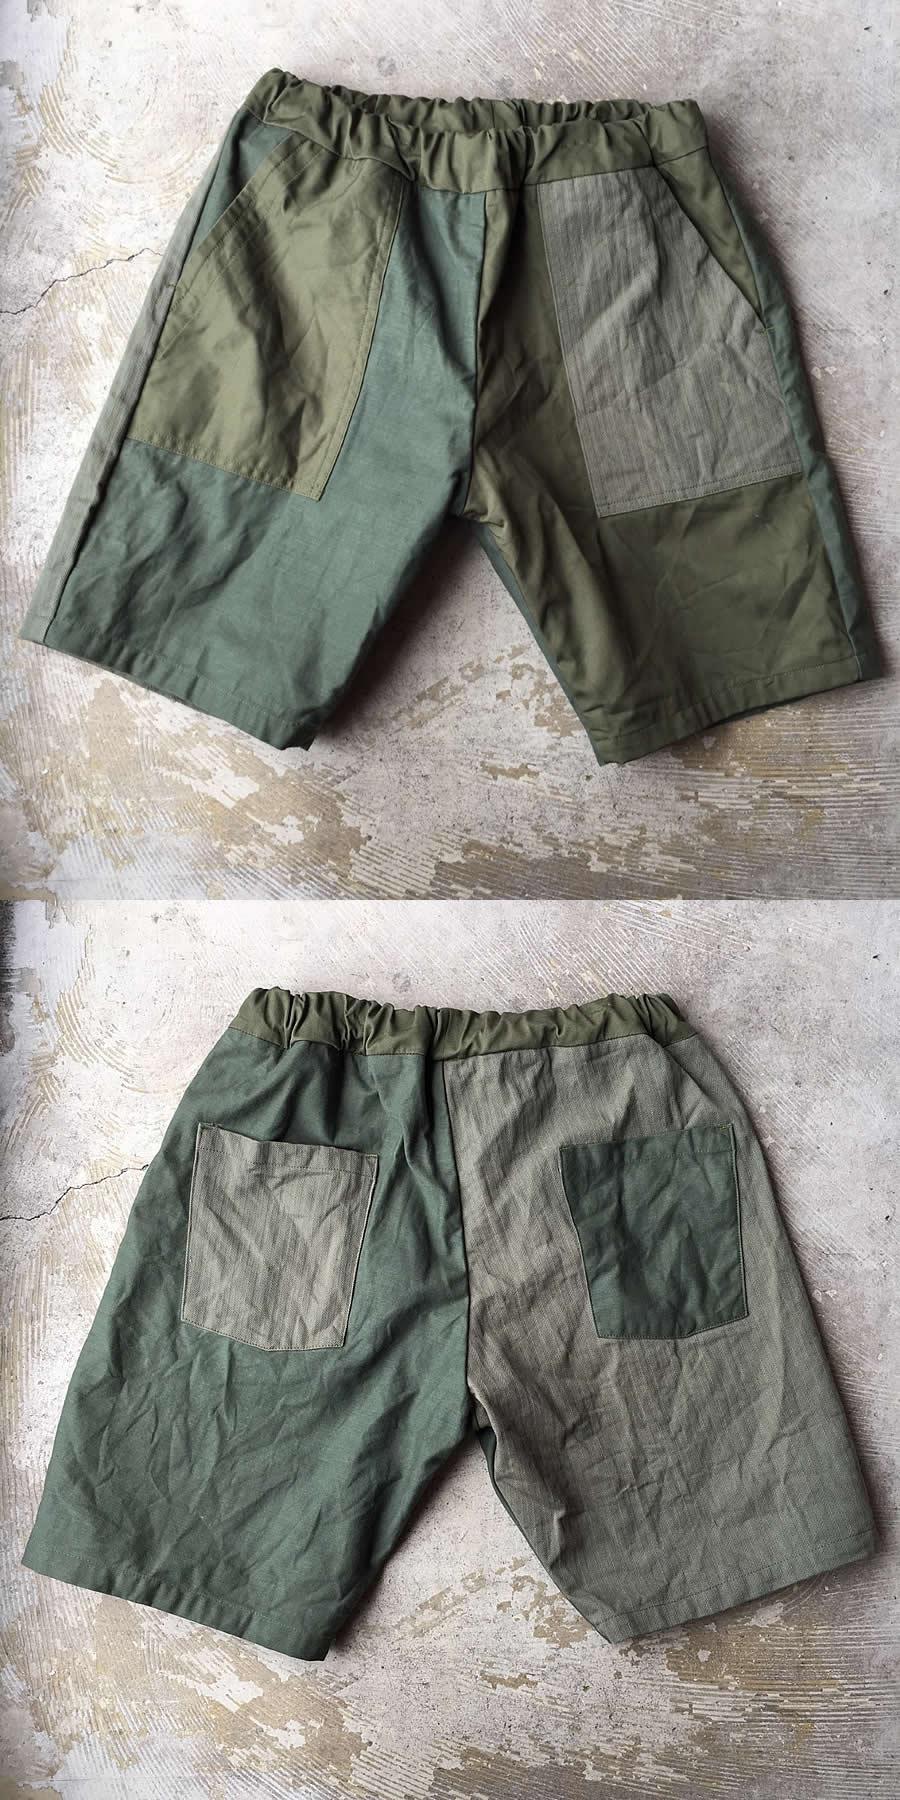 atelierdevetements-shorts-a-34.jpg